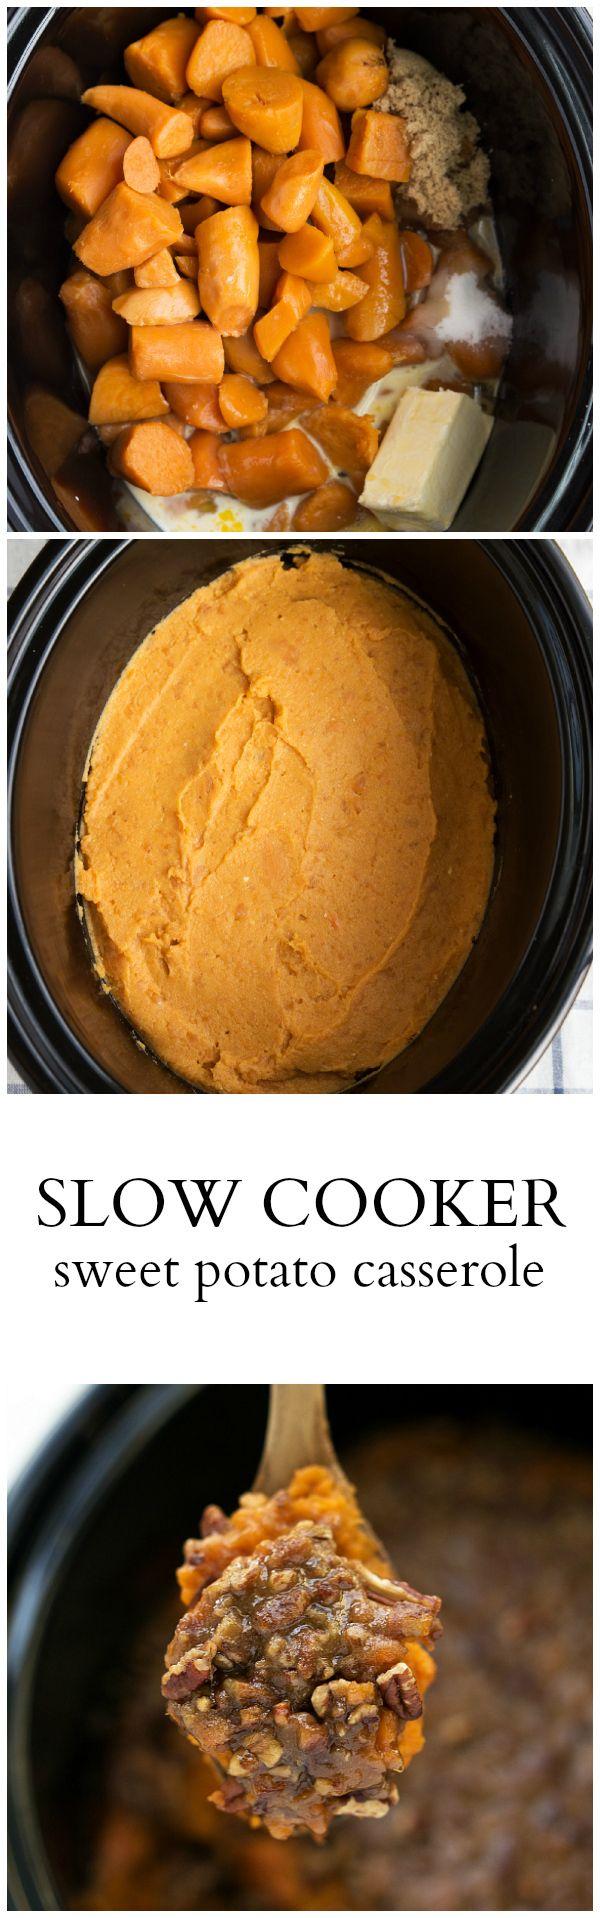 10 minutes prep, made completely in your CROCKPOT! {Slow Cooker} Sweet Potato Casserole #crockpot #sweetpotato #thanksgiving #sidedish #casserole